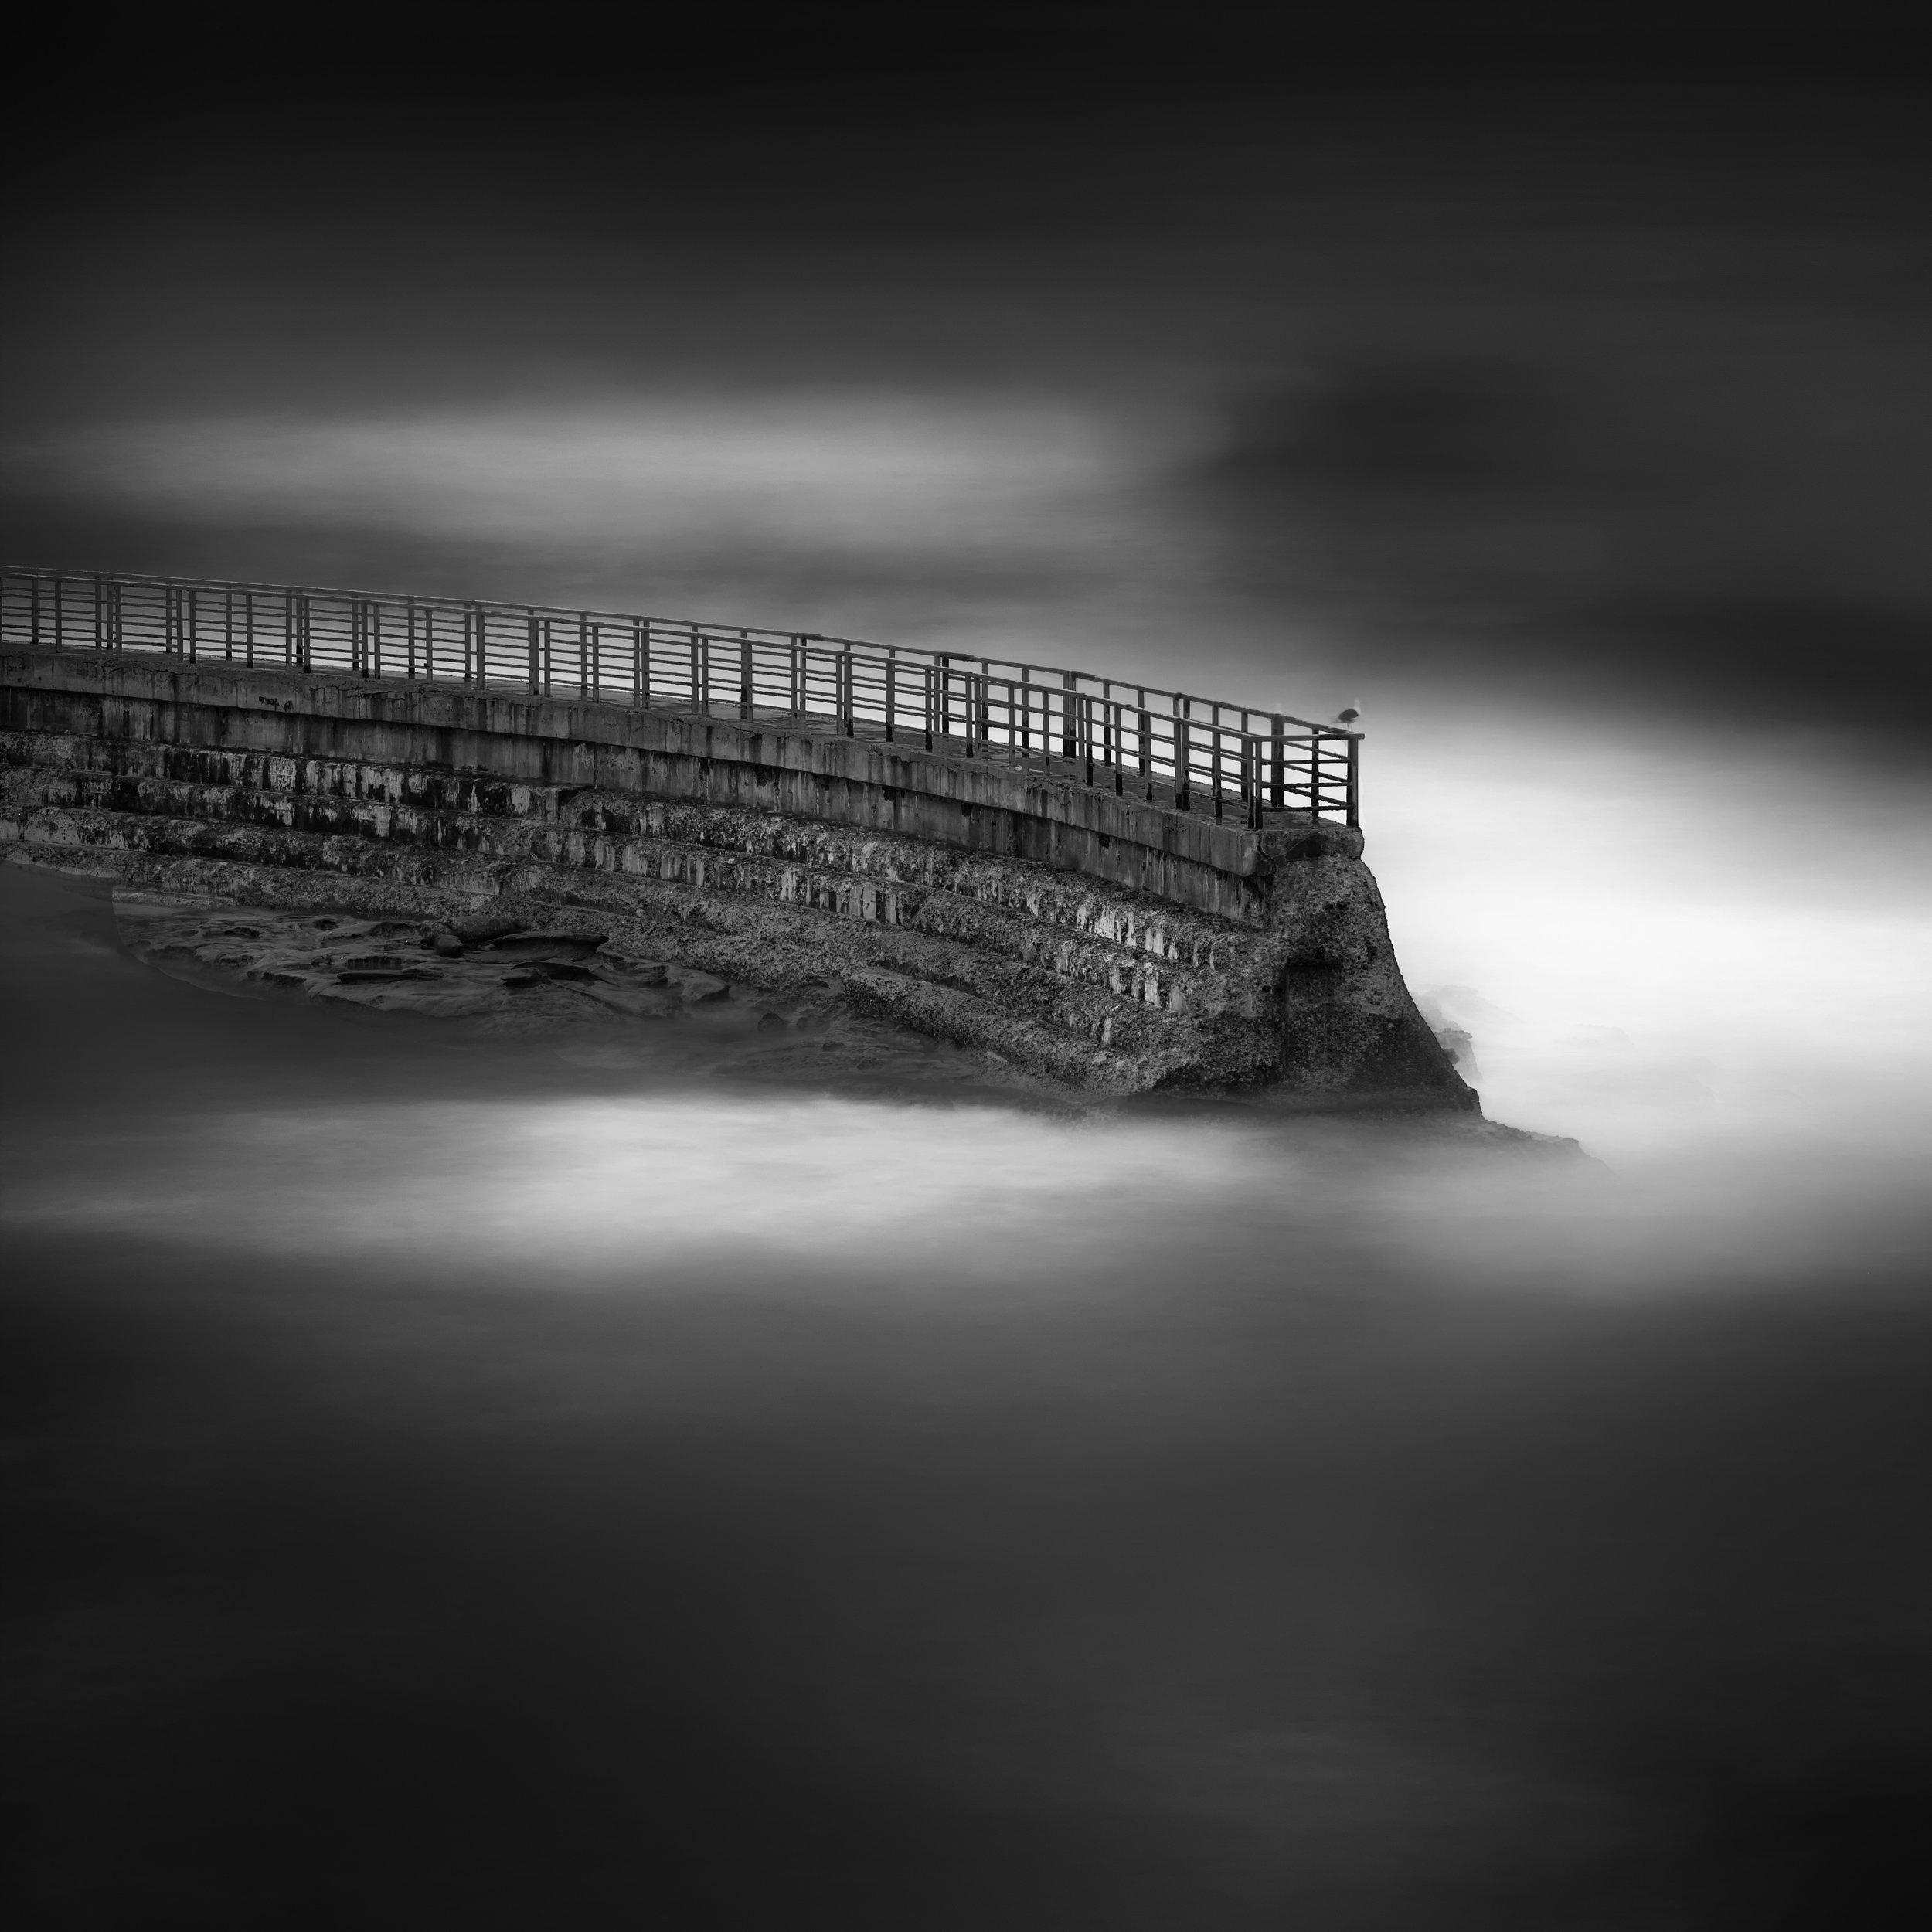 La Jolla black white children pool wall waves void dark moody